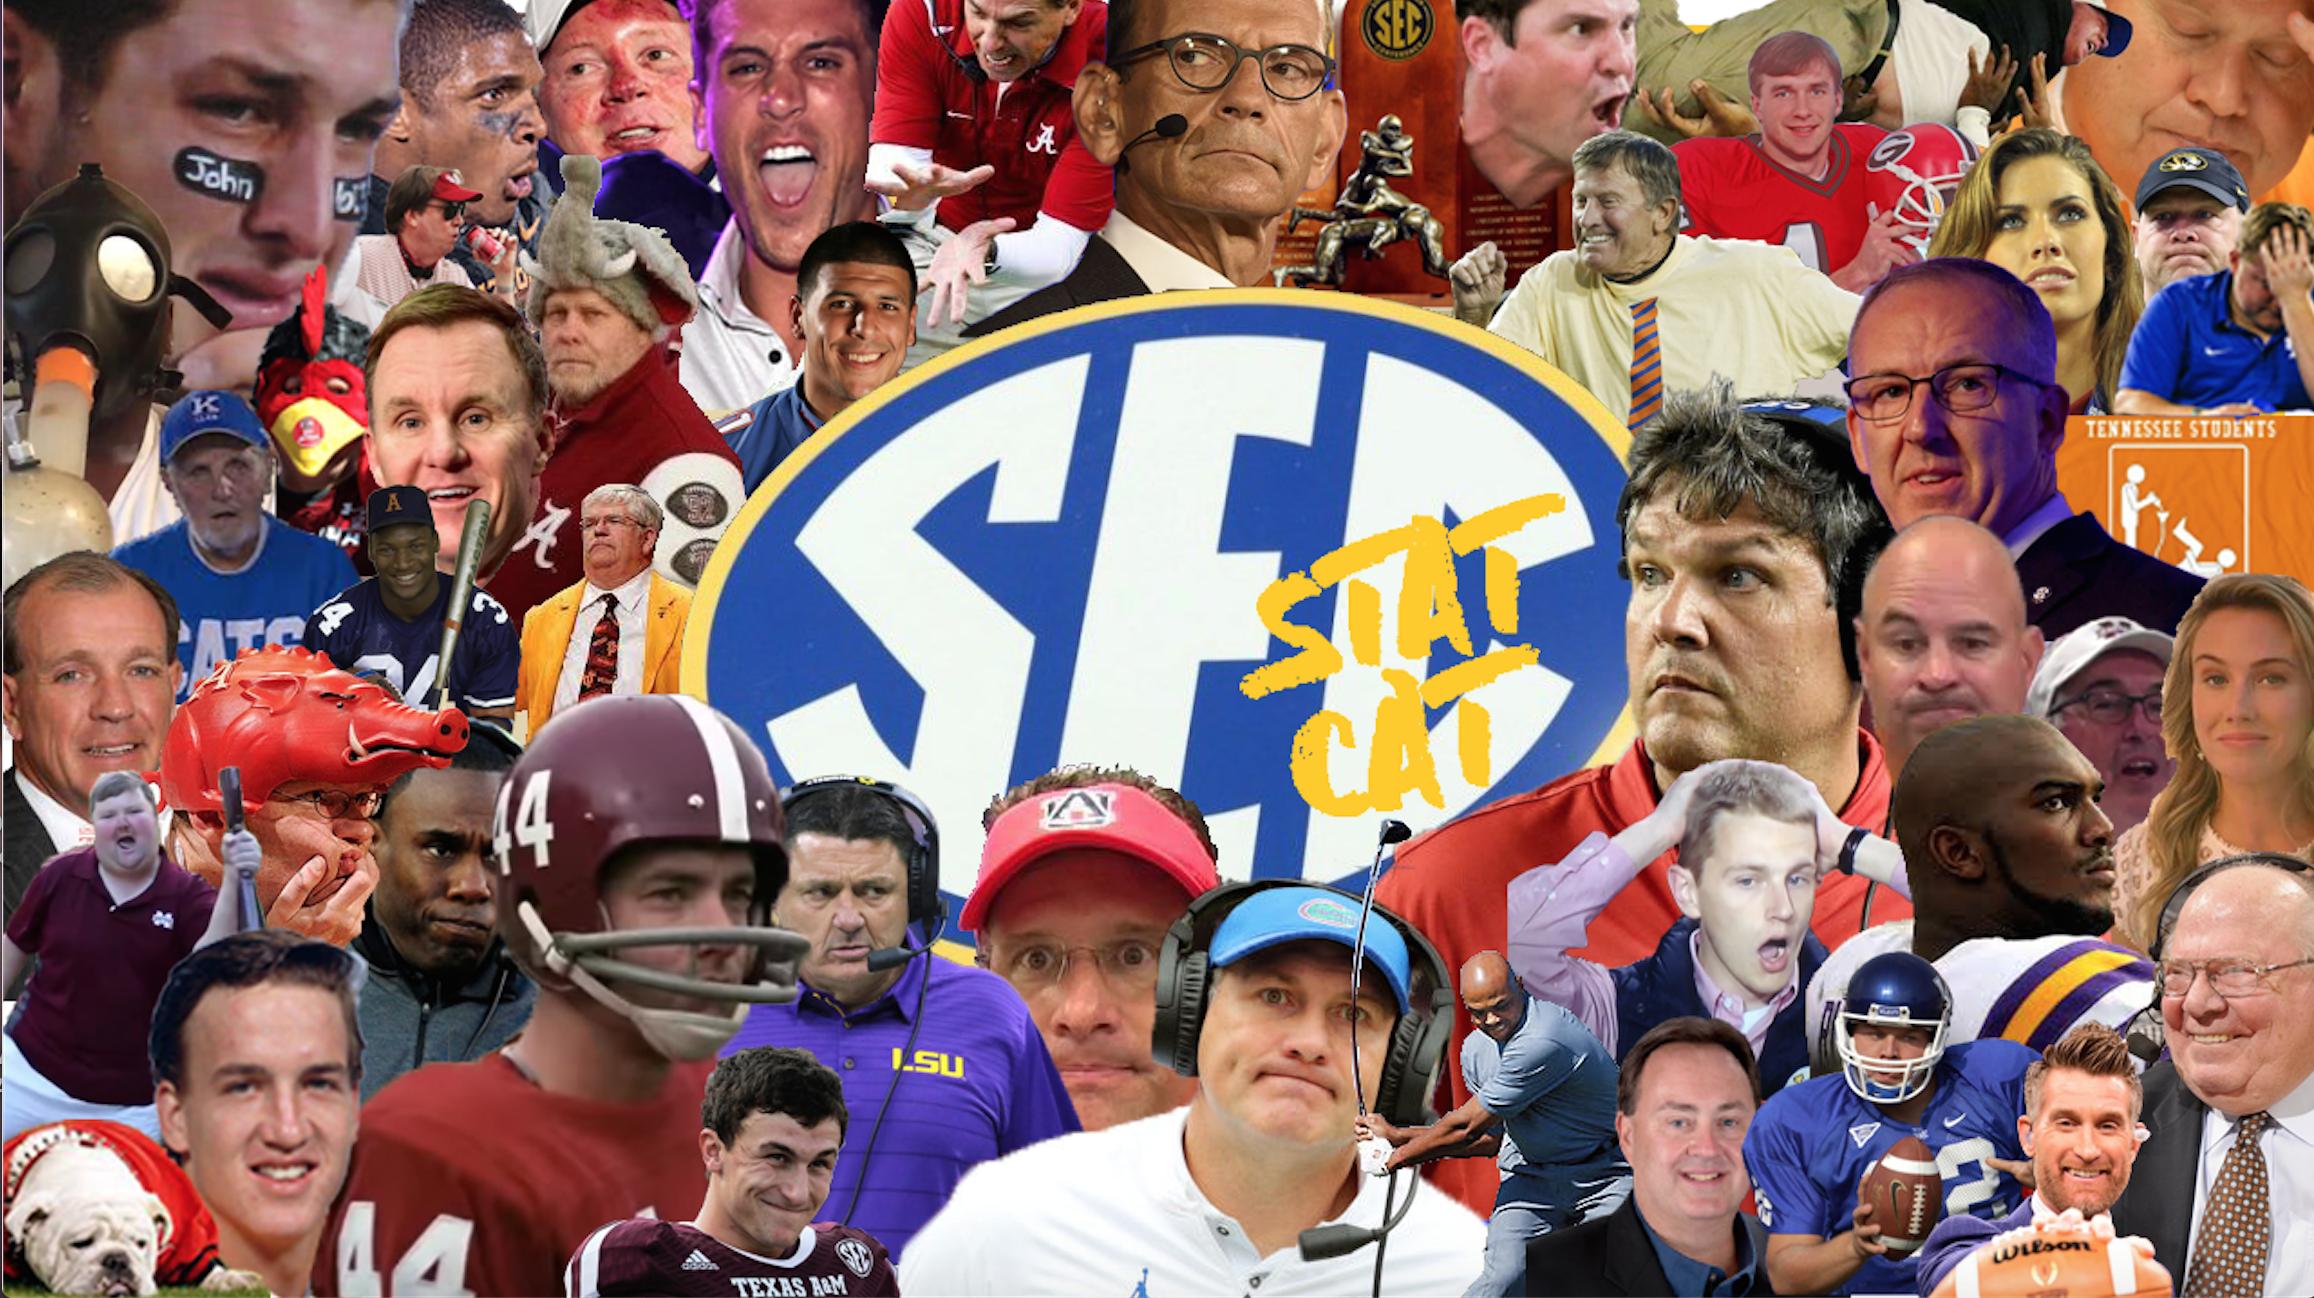 2019 SEC Statcast: LSU Under/Over